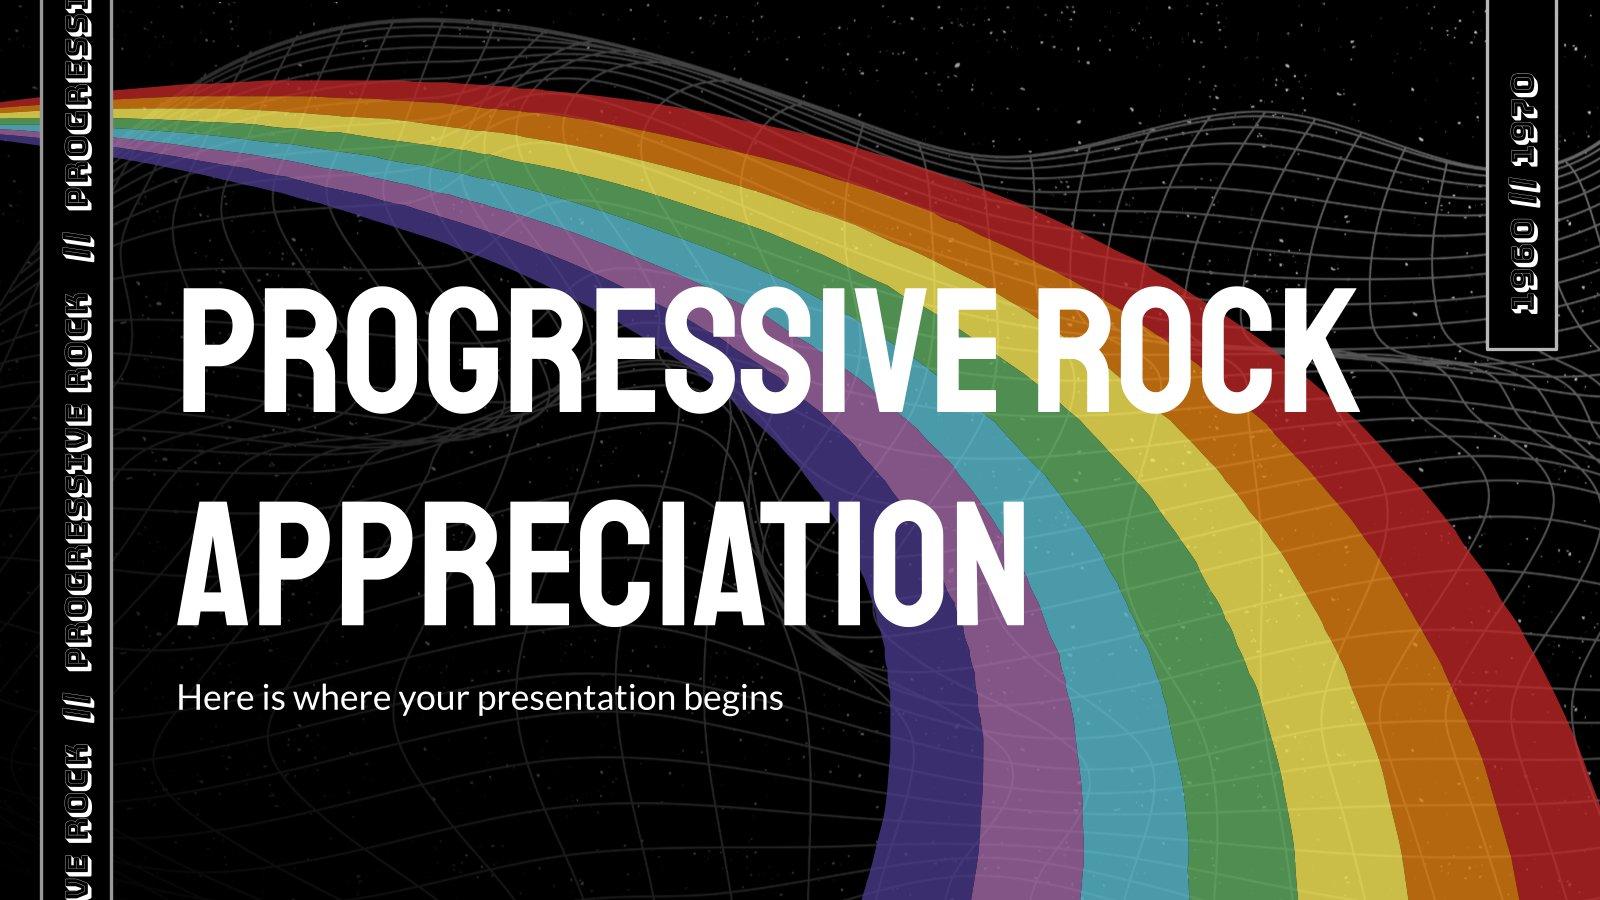 Progressive Rock Appreciation presentation template